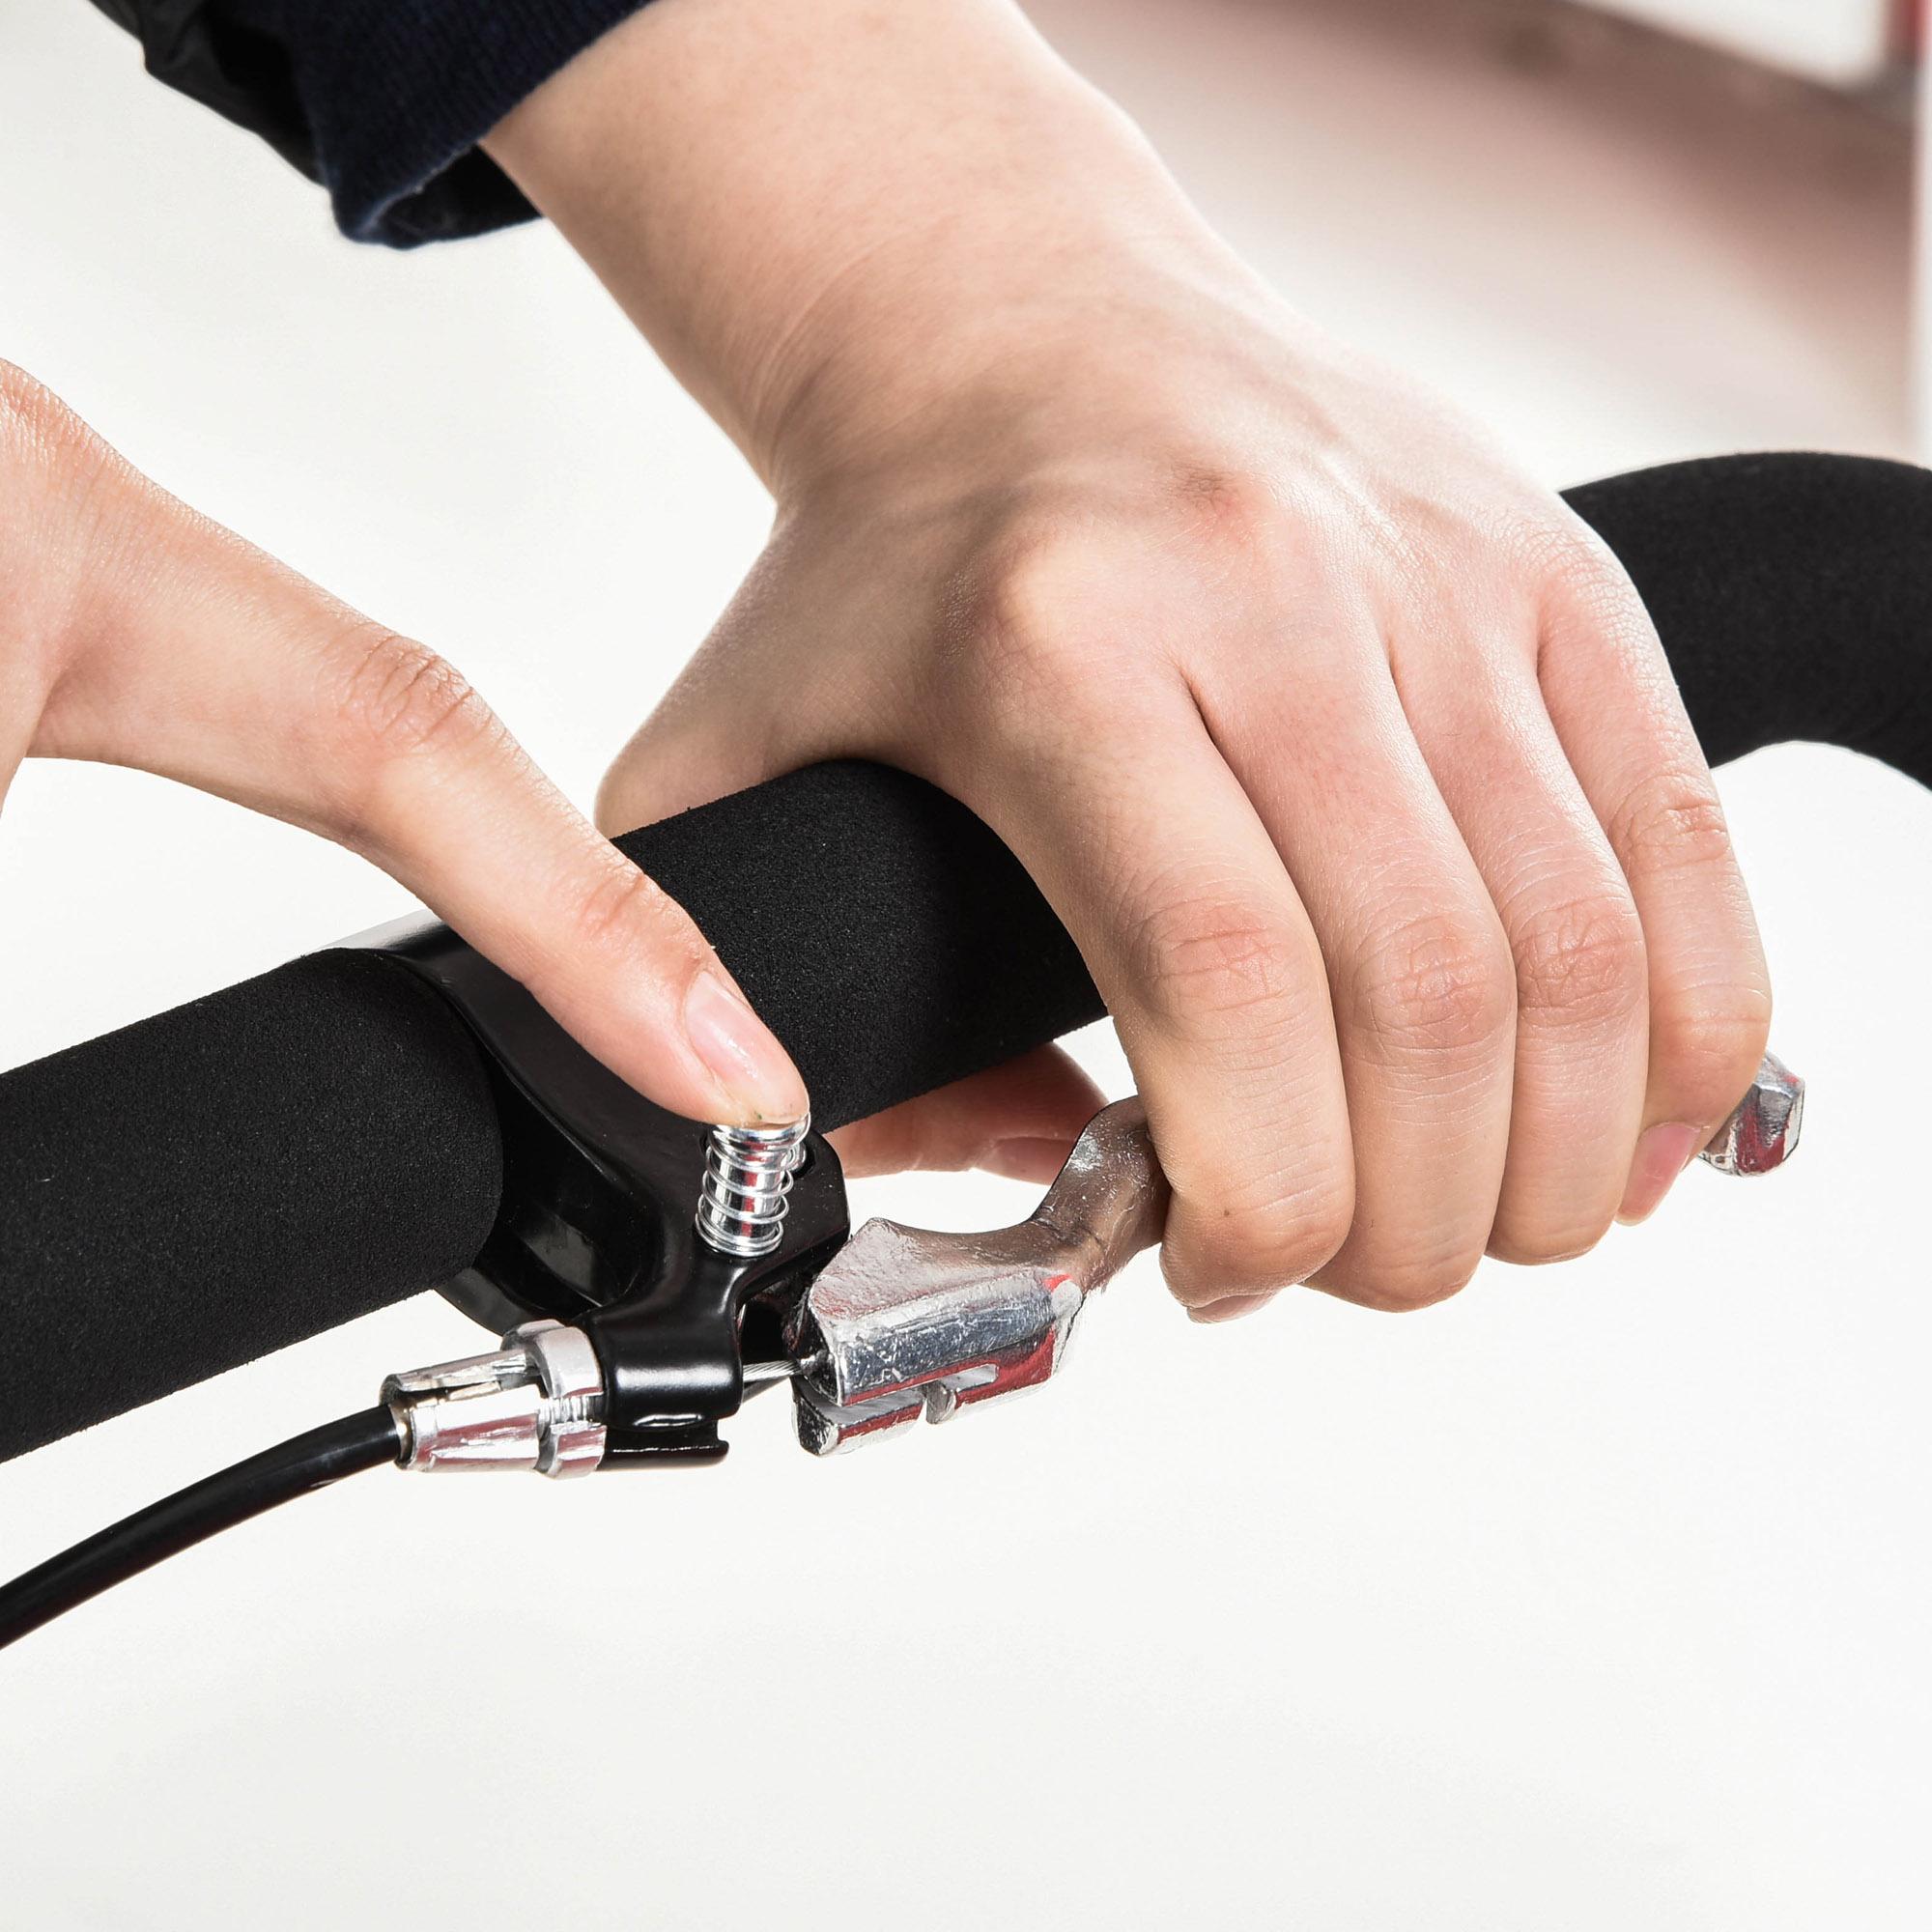 miniatura 25 - Remolque Bicicleta Niño 2 PLAZAS+Amortiguador Kit Footing Freno Bandera Cubierta